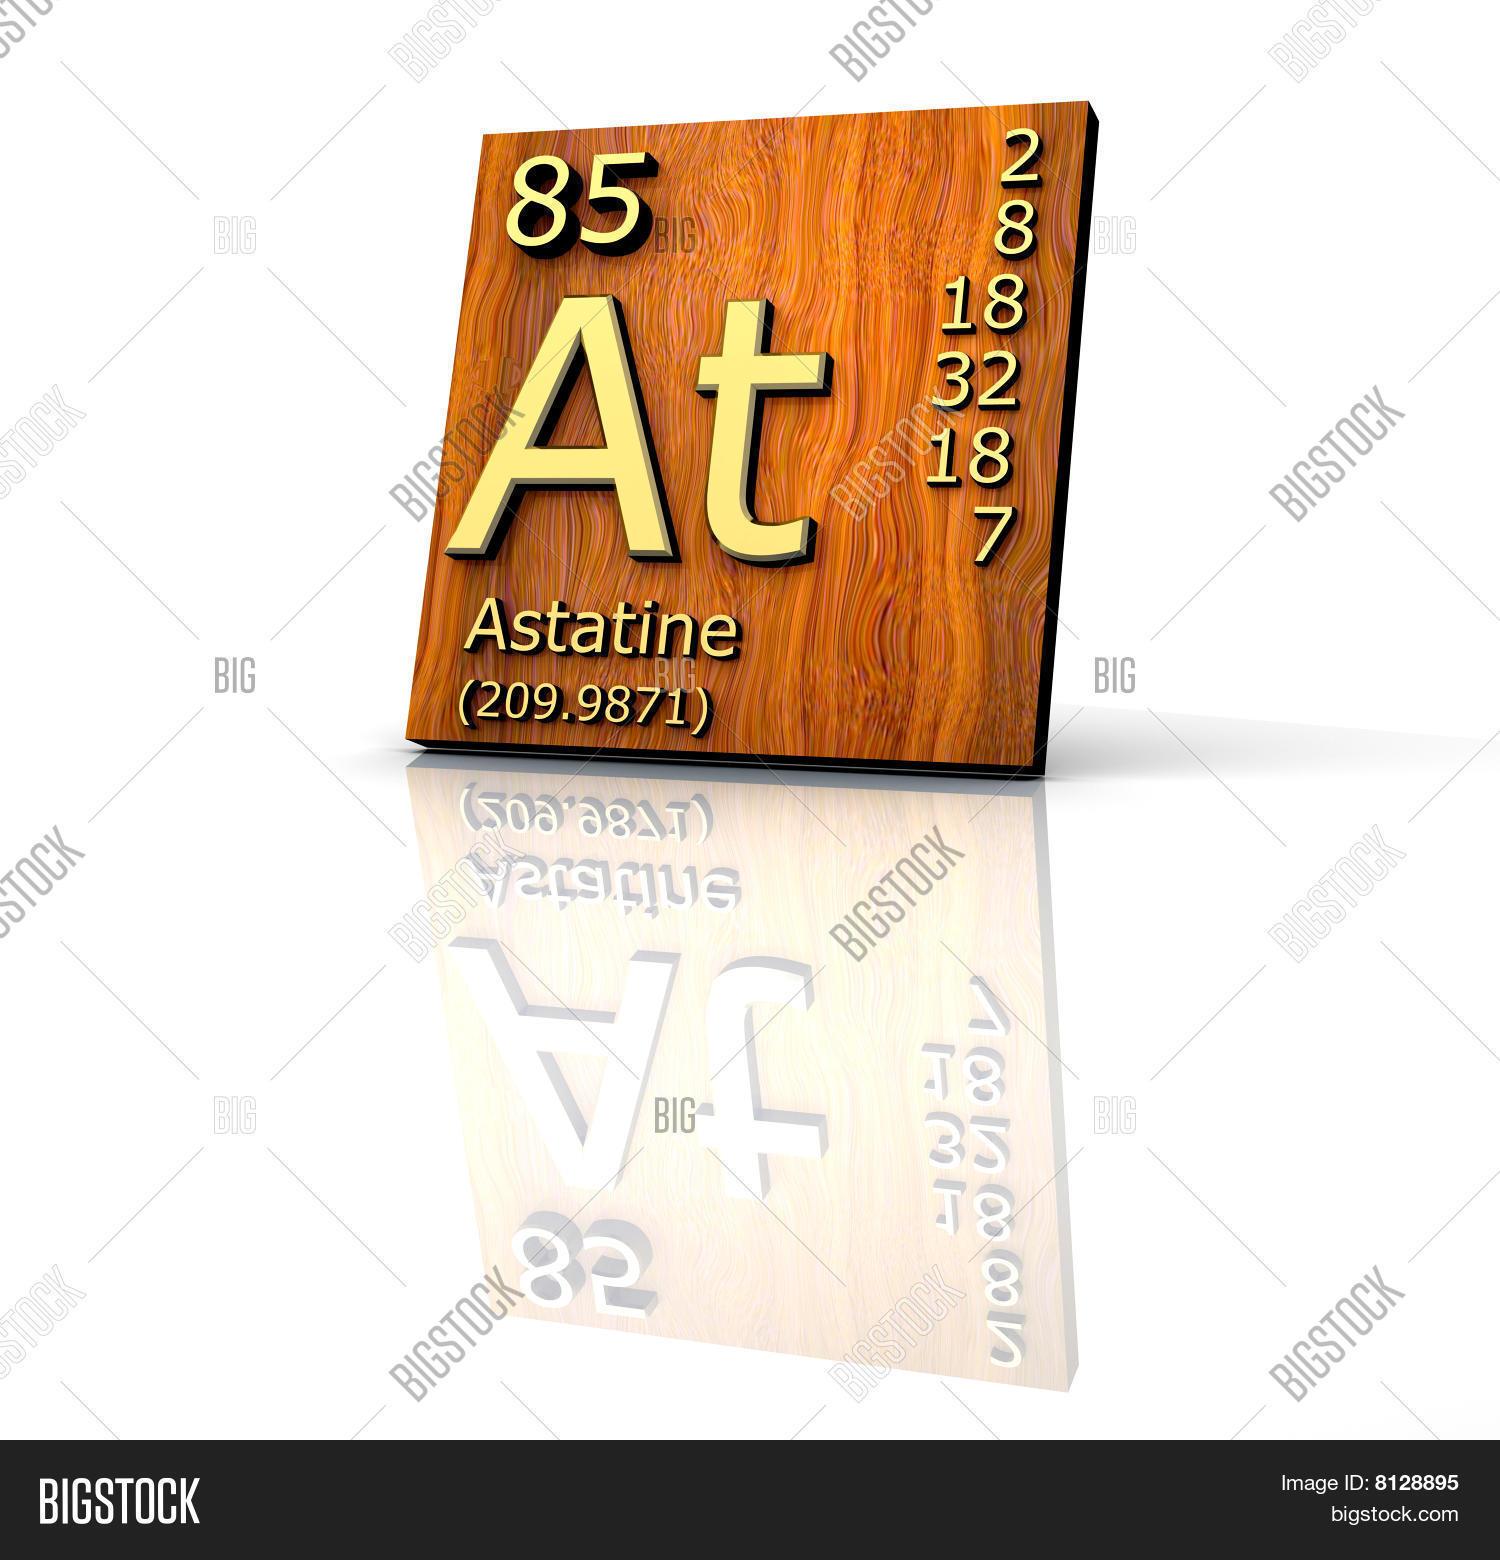 Astatine Form Periodic Image Photo Free Trial Bigstock